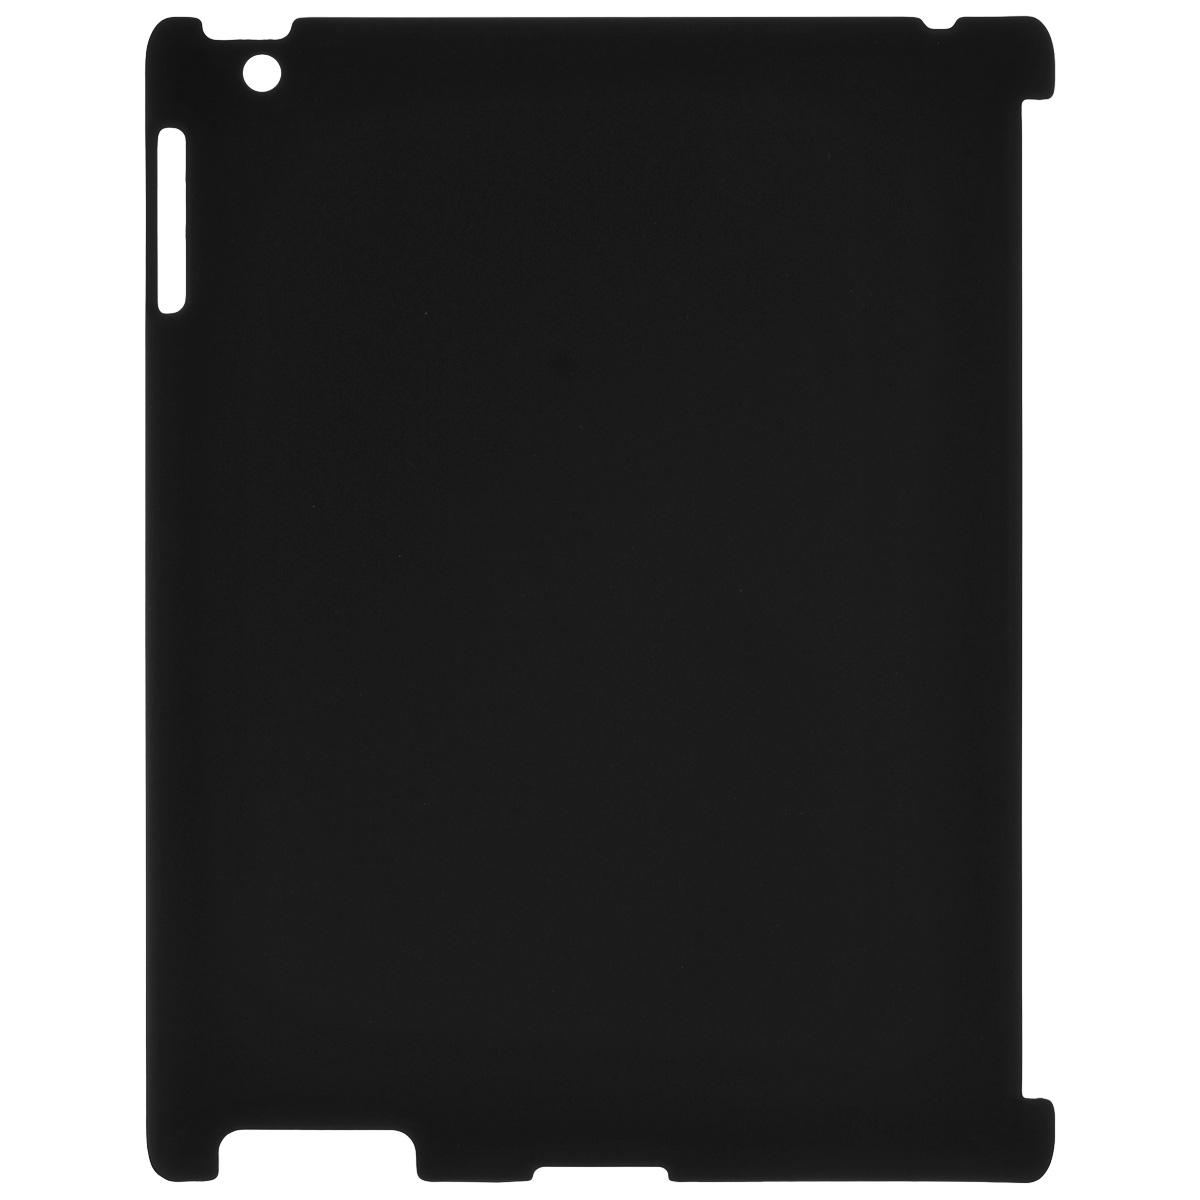 Black Horns чехол для iPad2, Black (BH-iD2201) универсальный стенд black horns для sony psp 2000 3000 bh psp02801